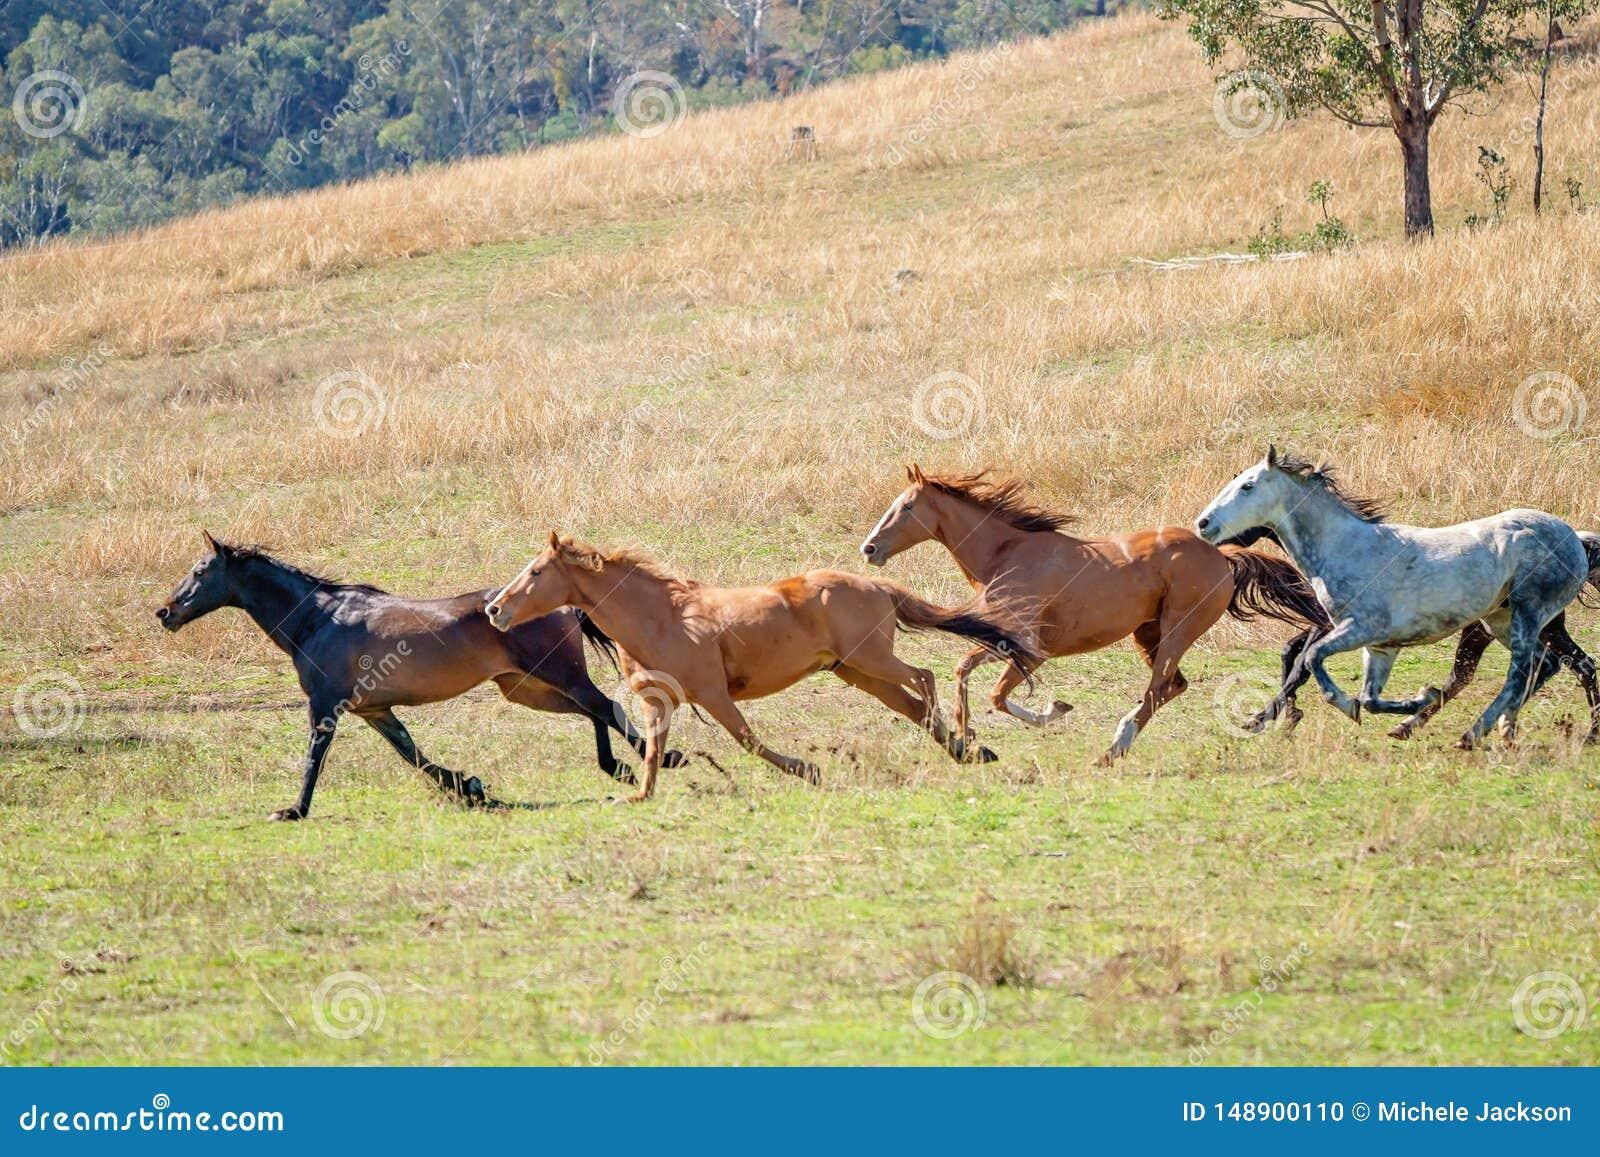 A Herd Of Running Wild Horses Stock Photo Image Of Follow Herd 148900110